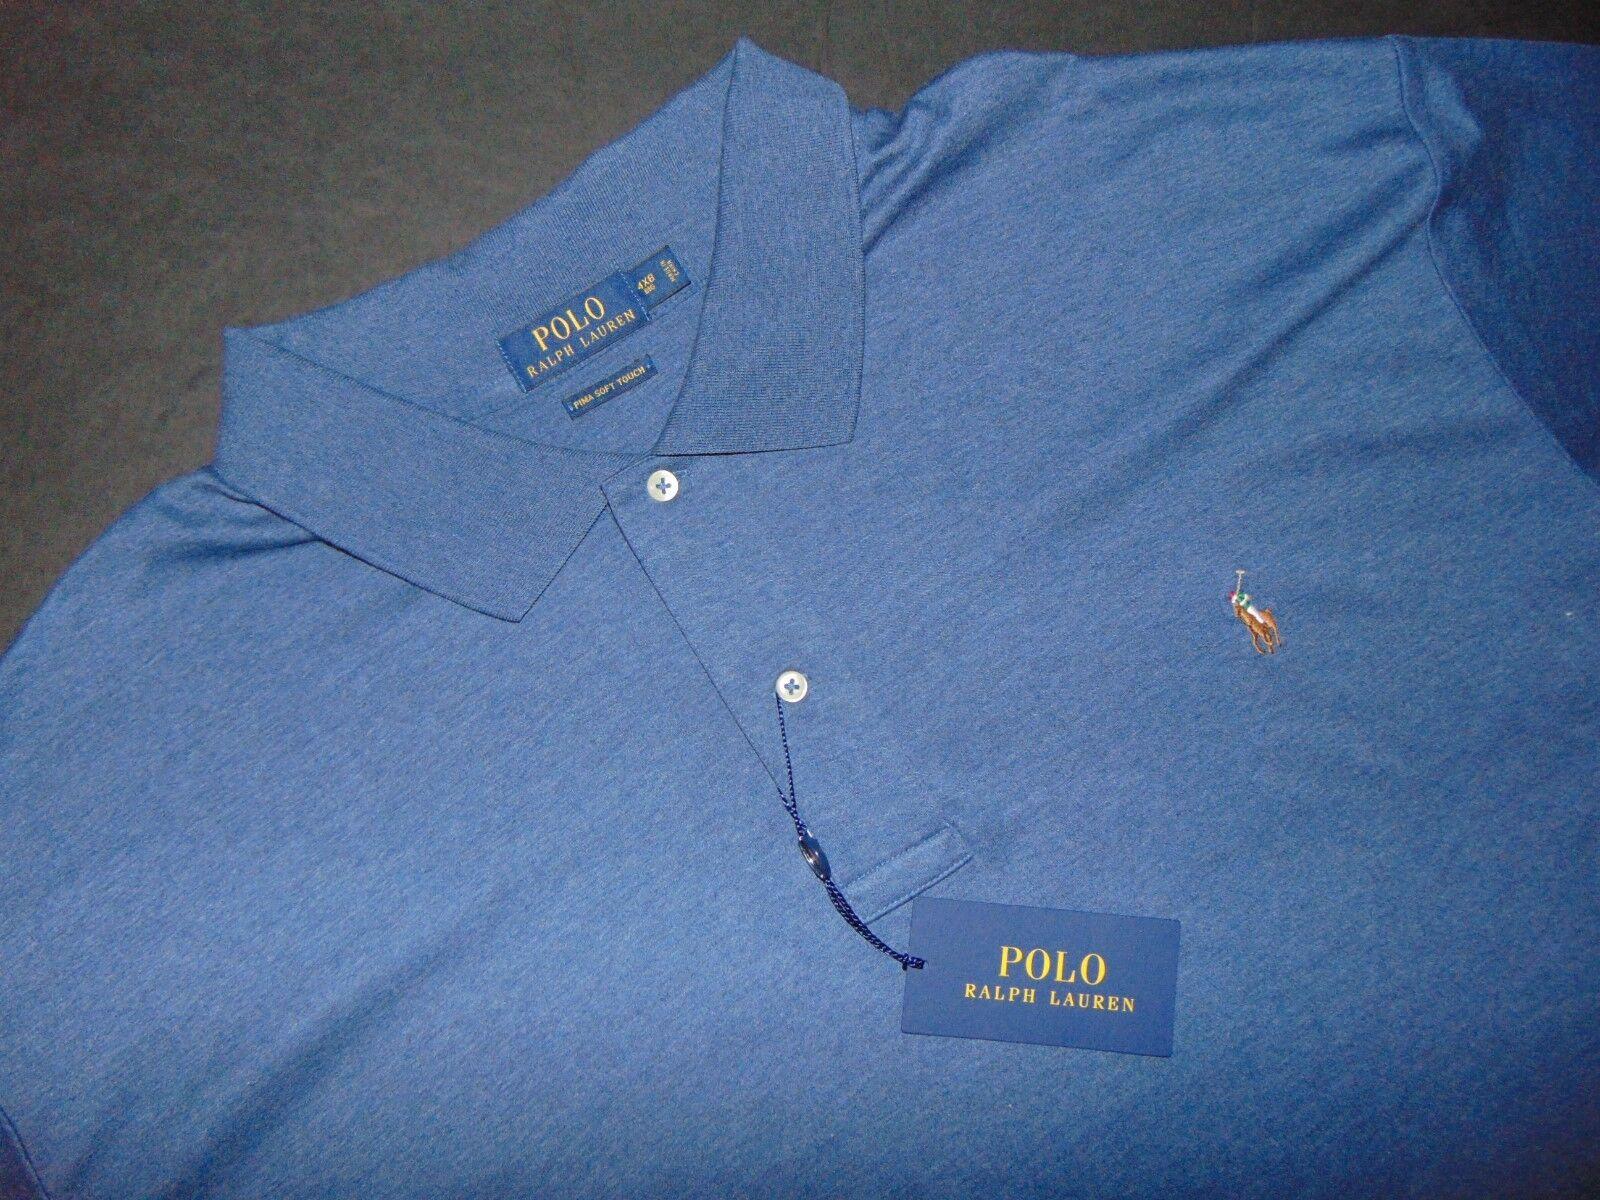 NWT, POLO by RALPH LAUREN Polo Shirt  4XB  Big & Tall  bluee